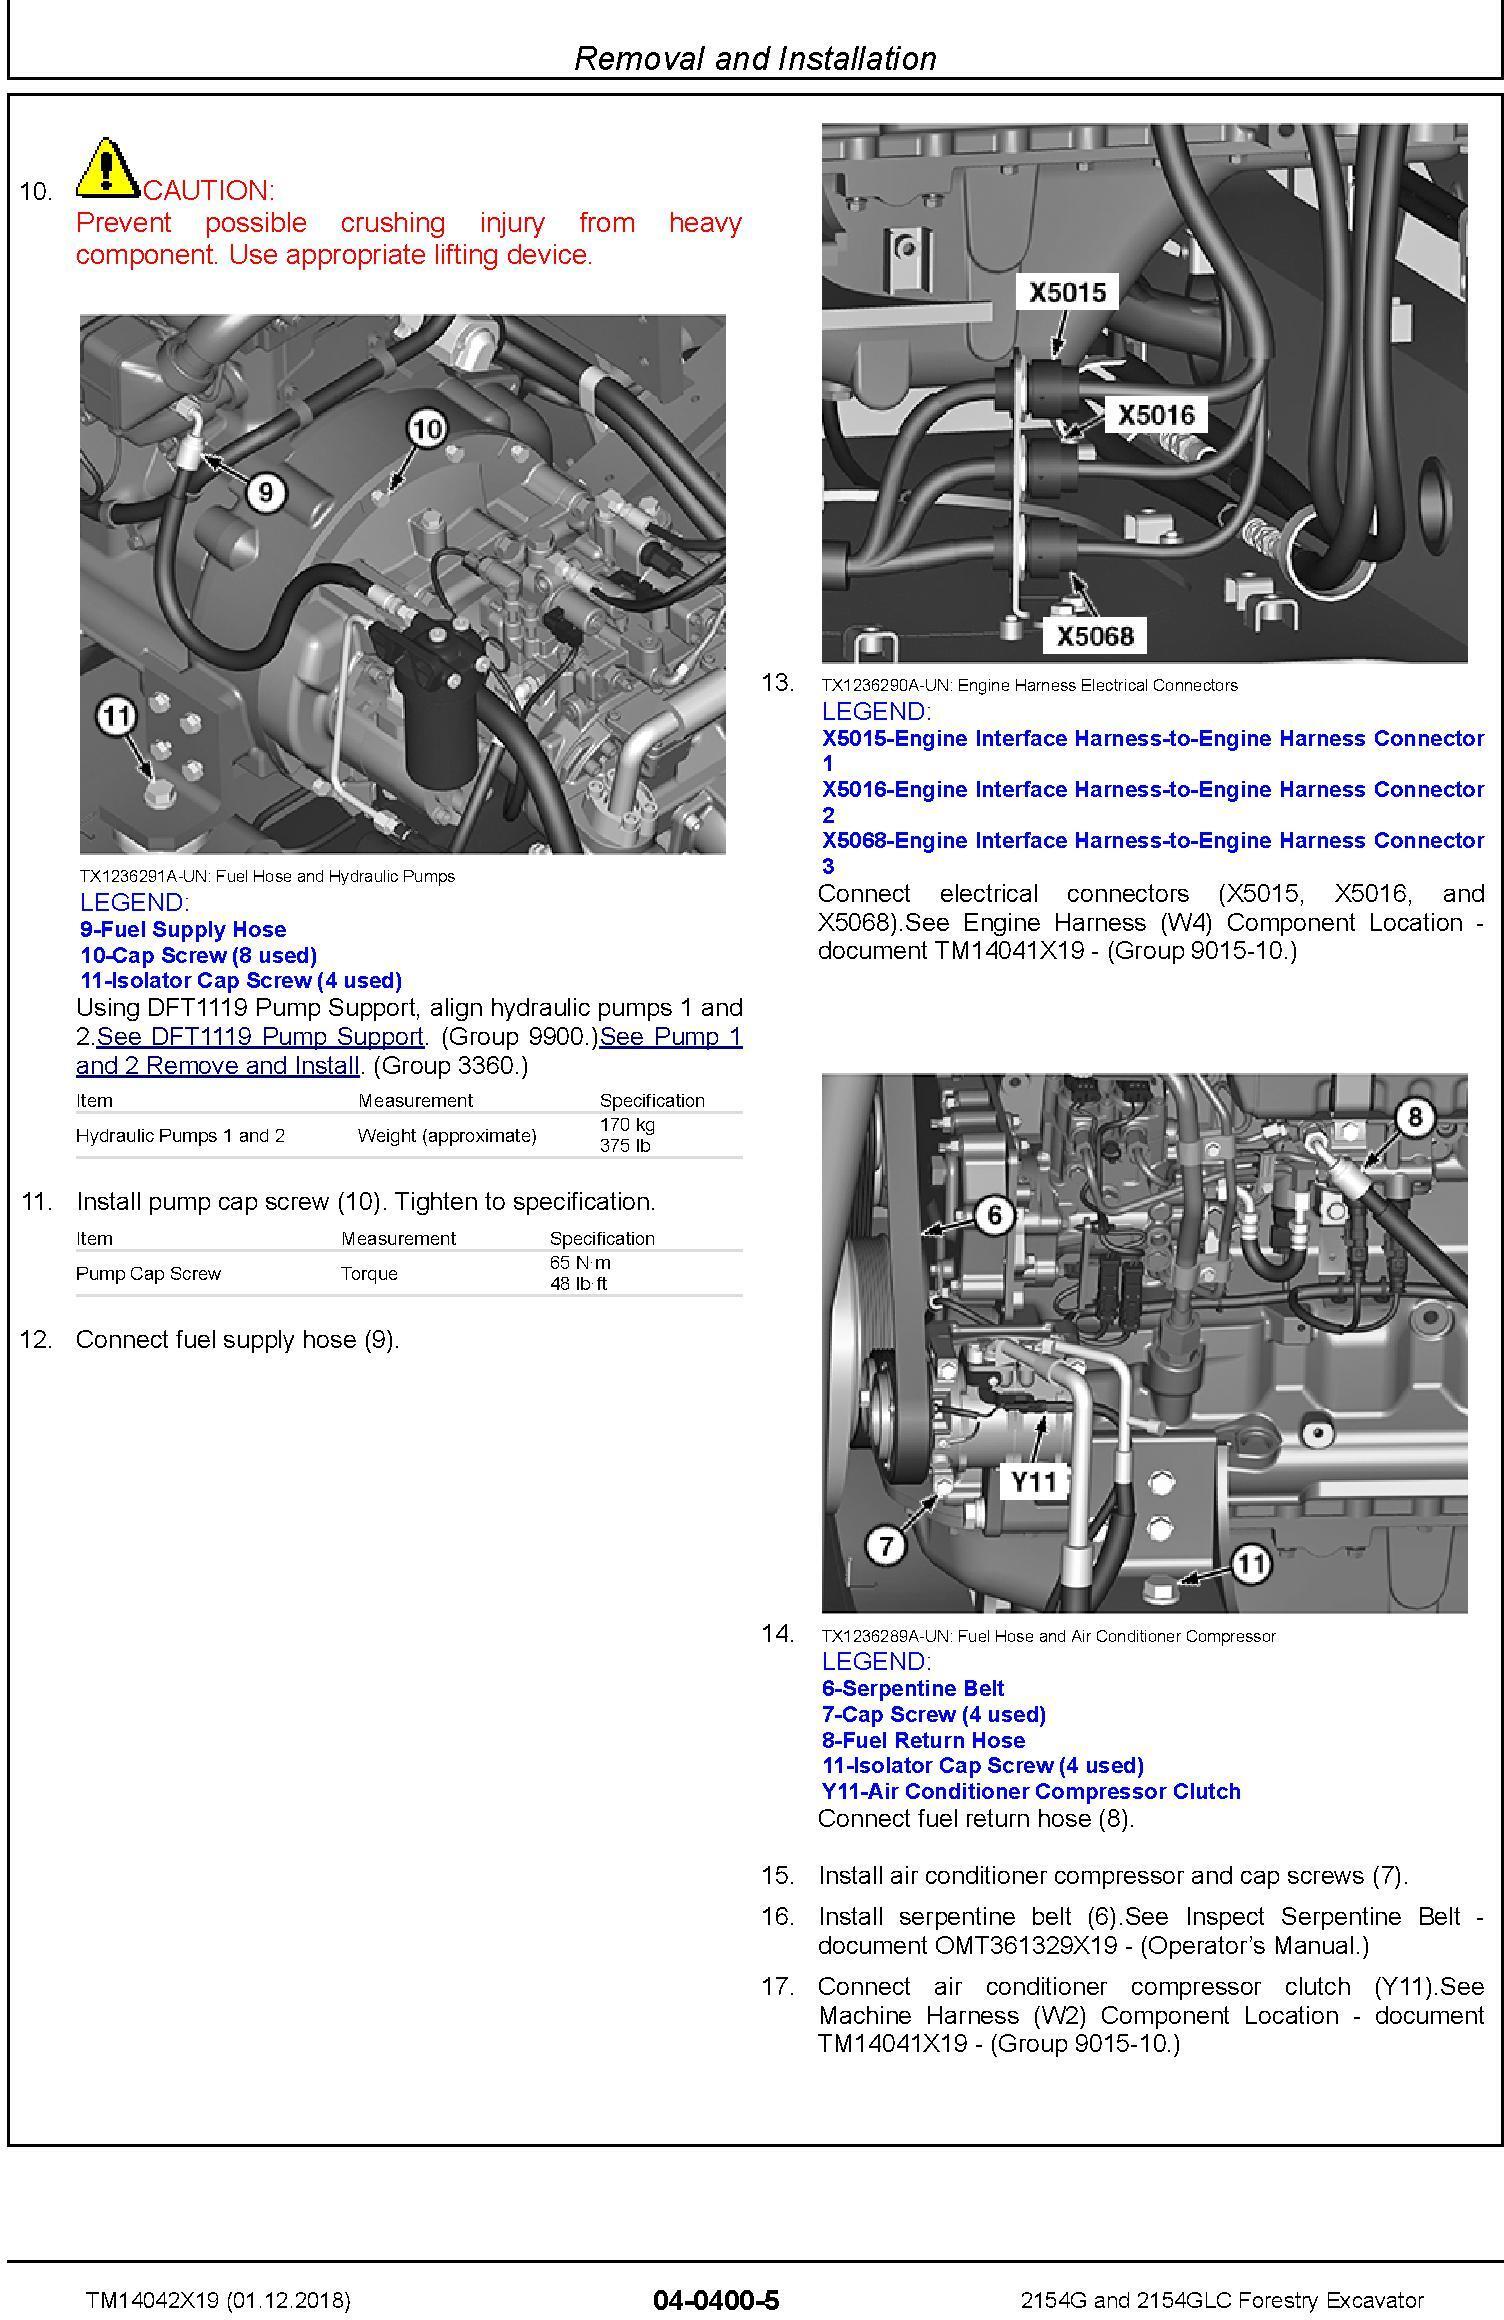 John Deere 2154G, 2154GLC (SN. F212400-) Forestry Excavator Repair Technical Manual (TM14042X19) - 3